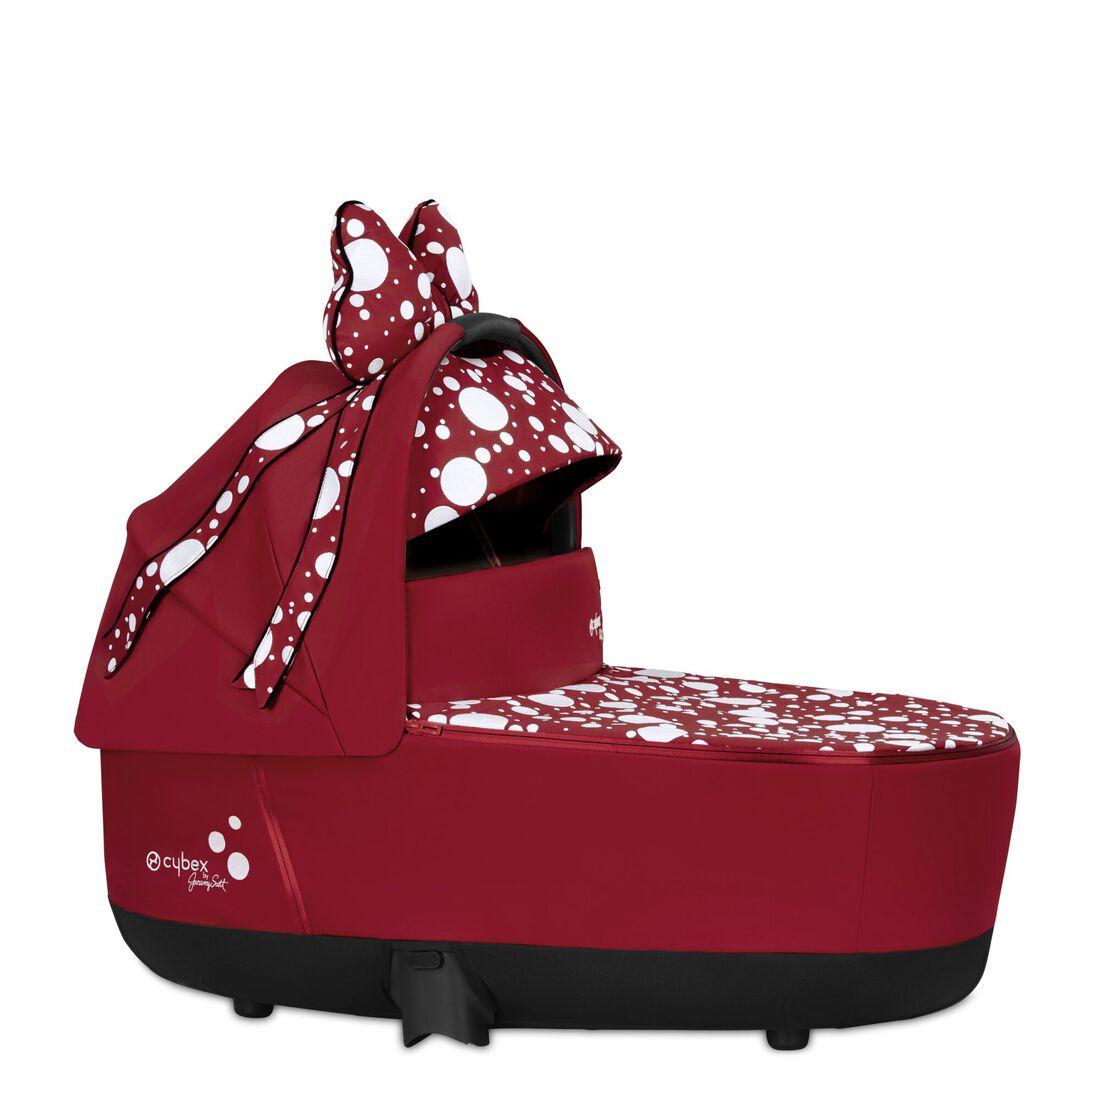 CYBEX Priam Lux Carry Cot - Petticoat Red in Petticoat Red large Bild 2